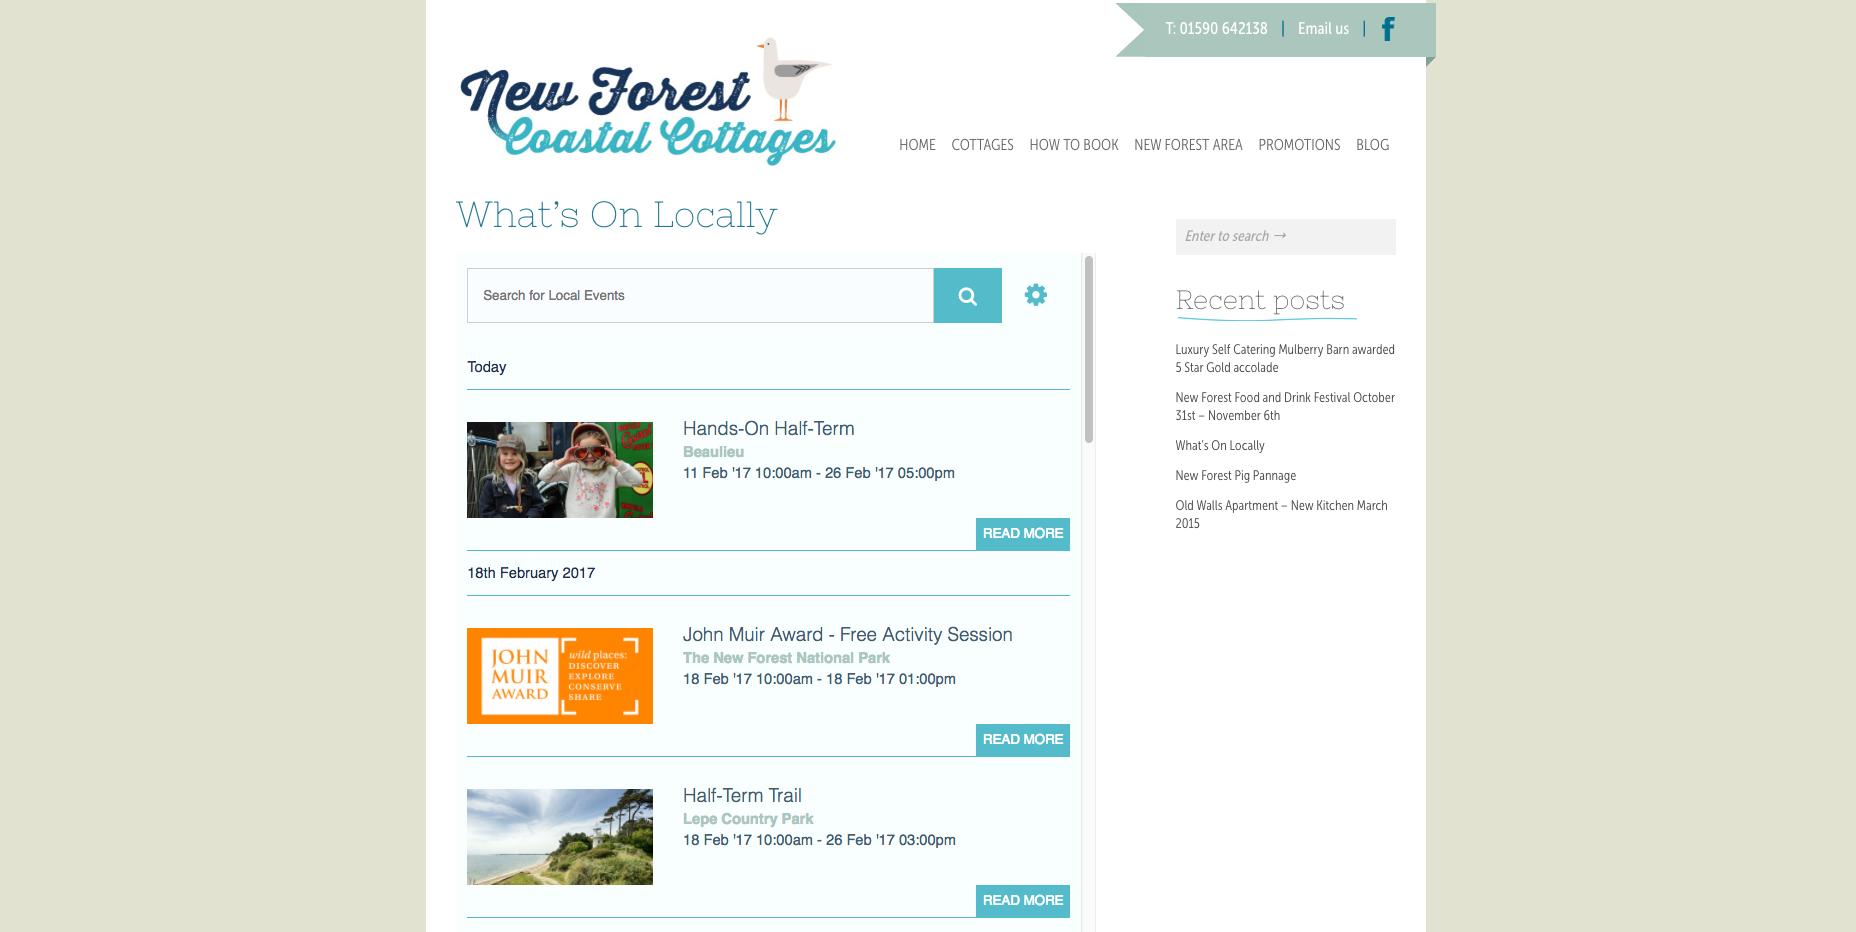 New Forest Coastal Cottages Events Widget.png